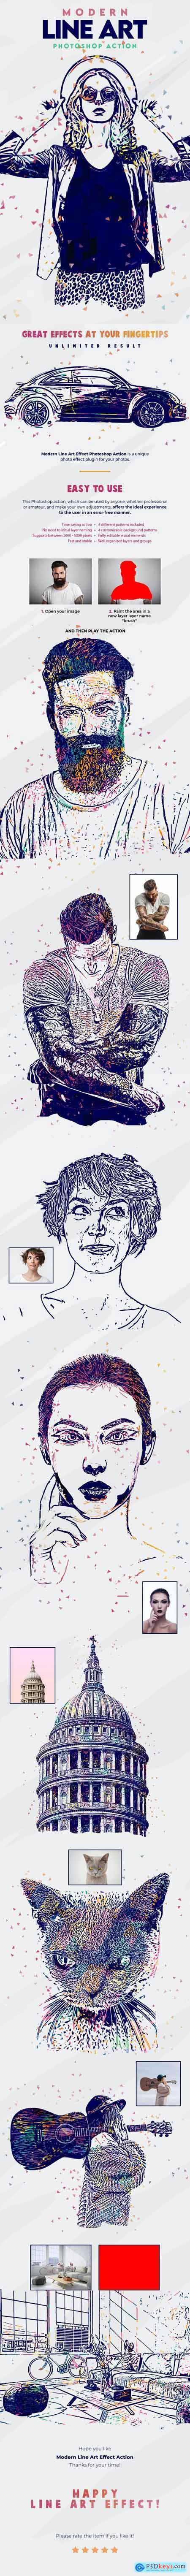 Modern Line Art Effect Photoshop Action 26986358